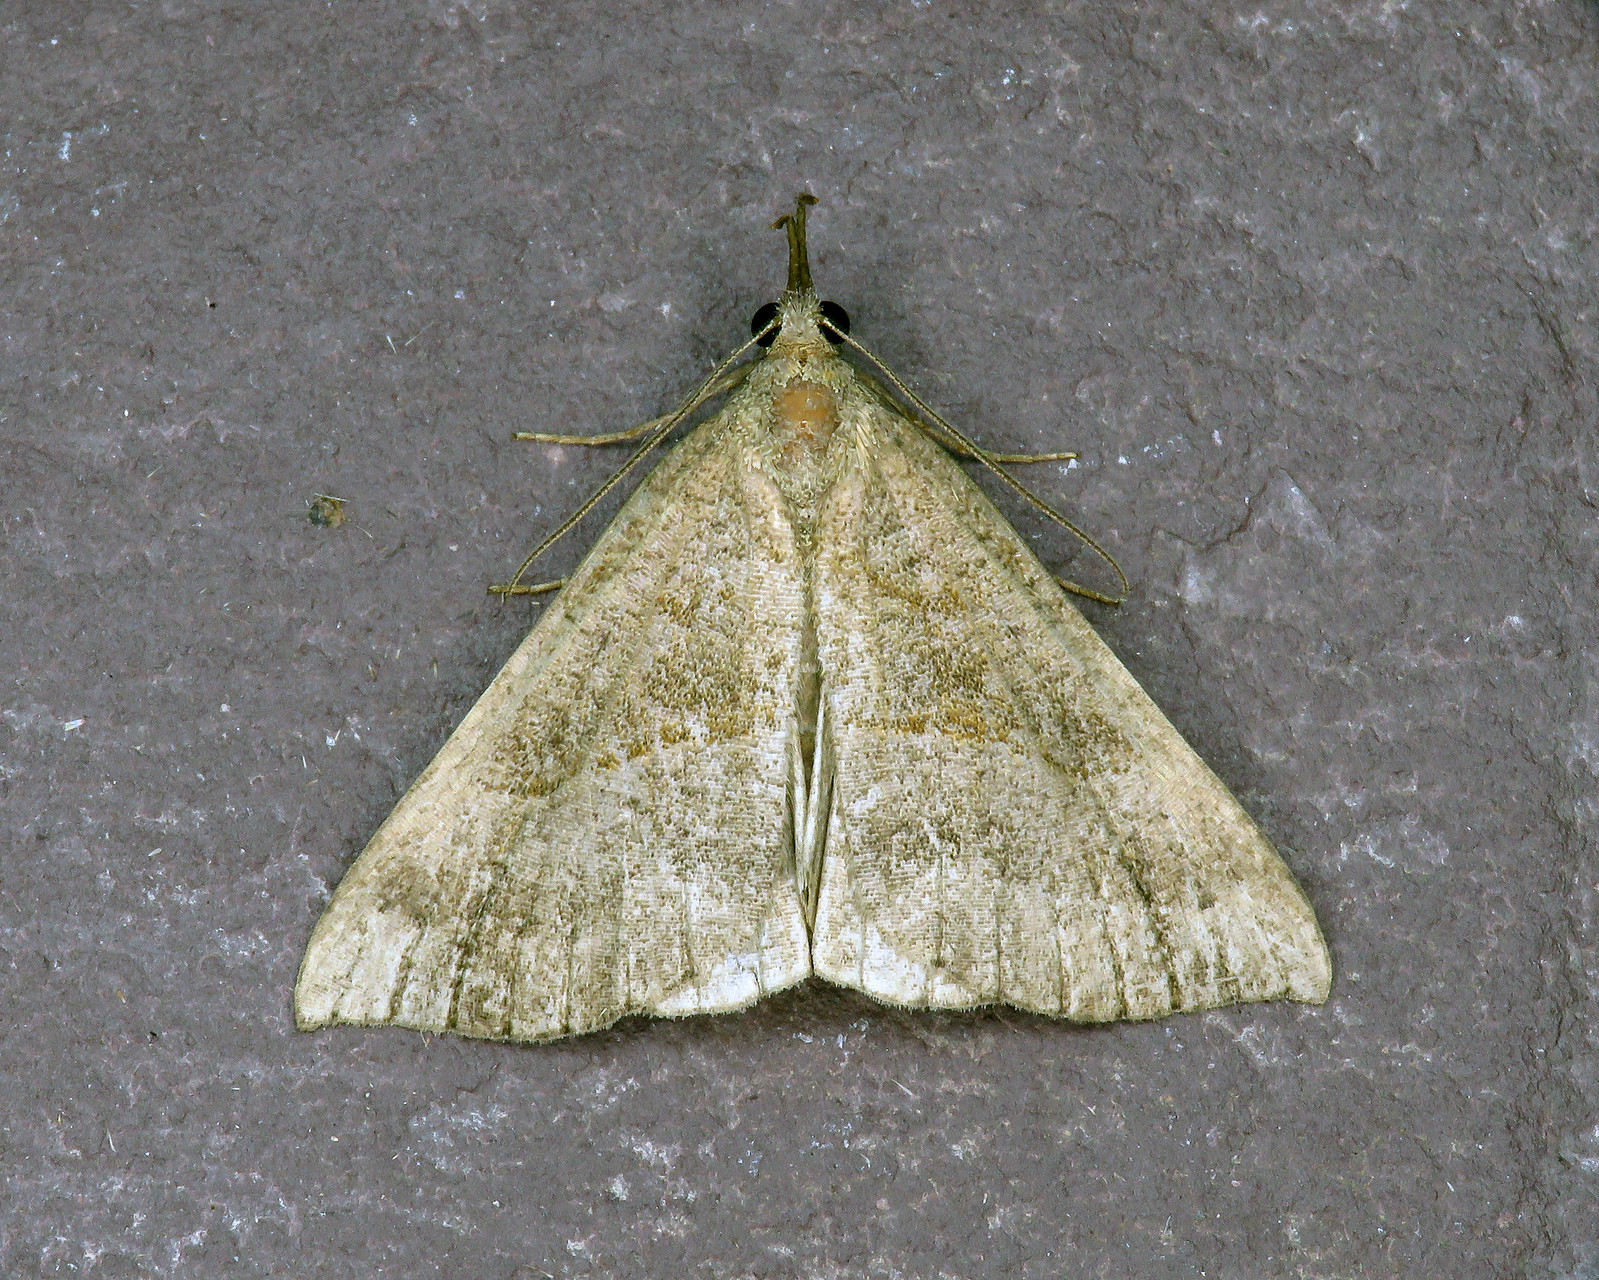 72.003 Snout - Hypena proboscidalis